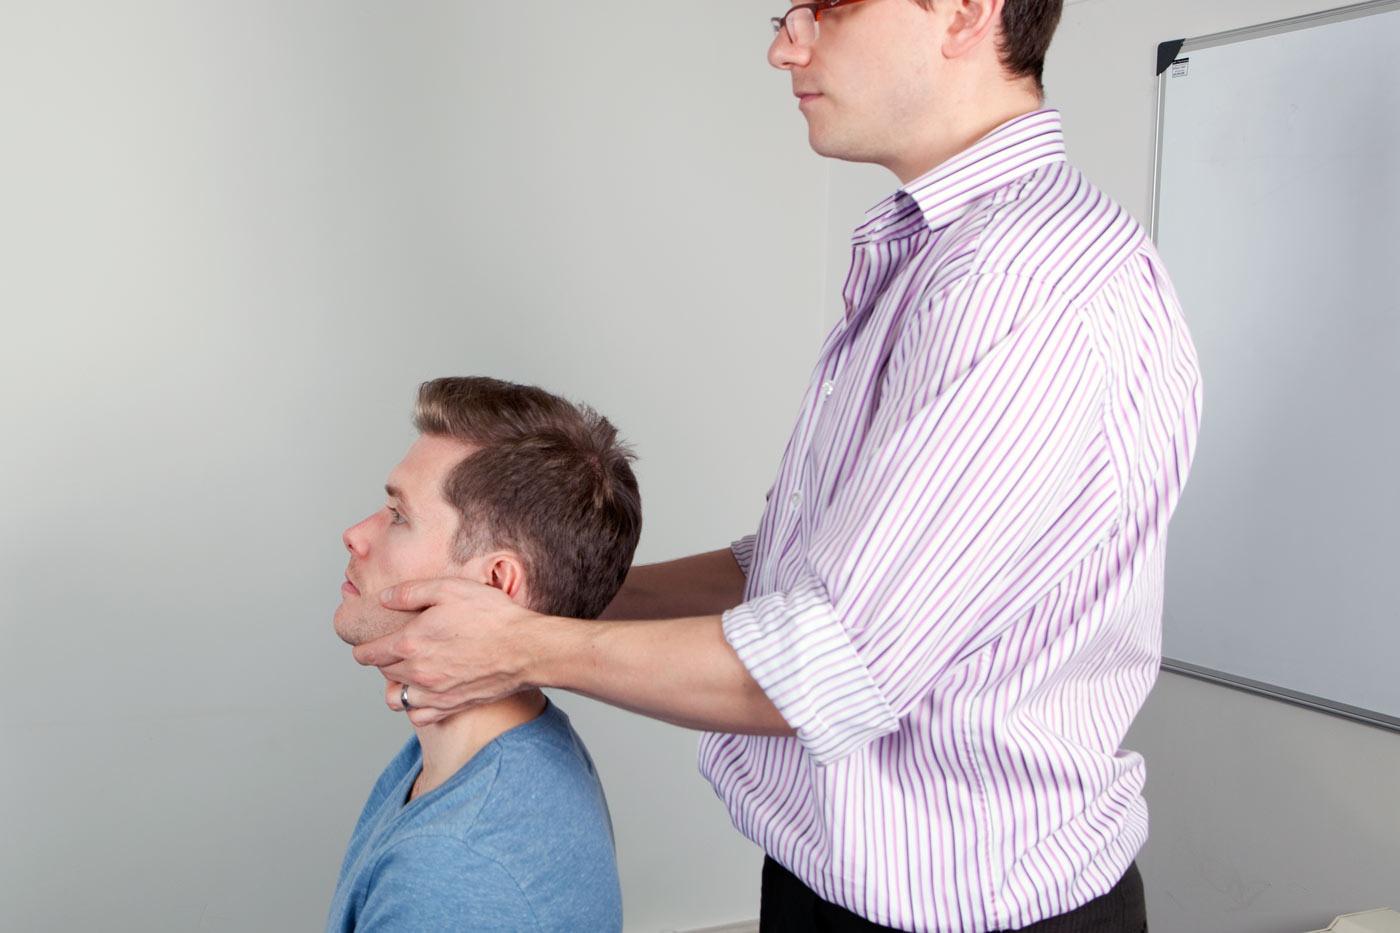 Examine the cervical lymph nodes